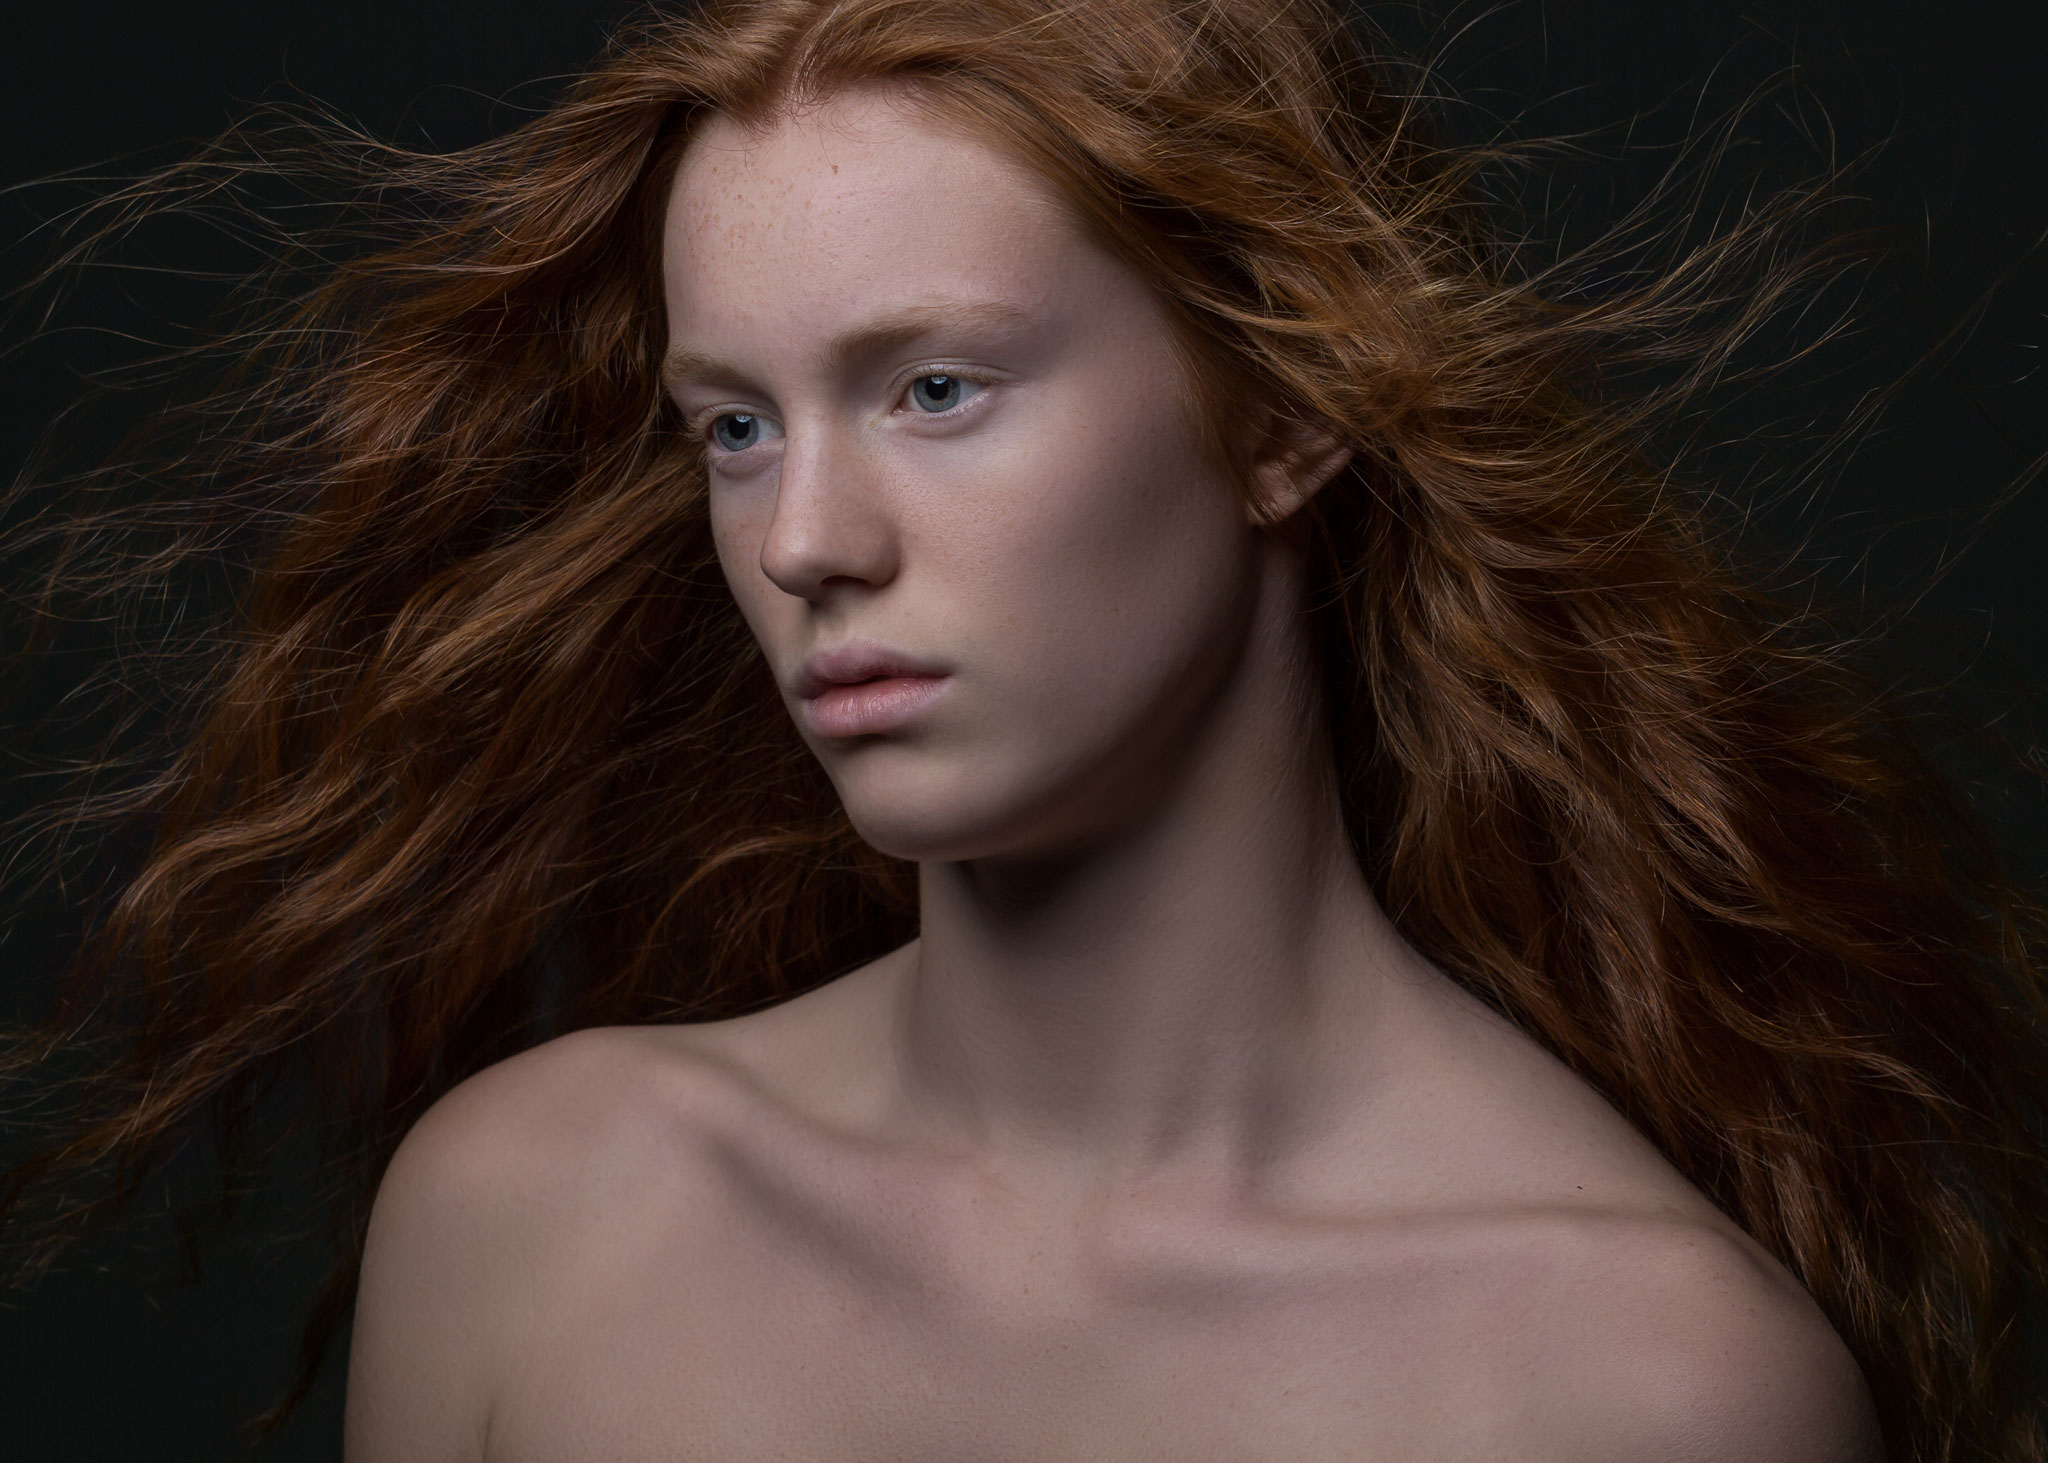 Portfolio - Portret - Carine Belzon | Fotograaf Friesland